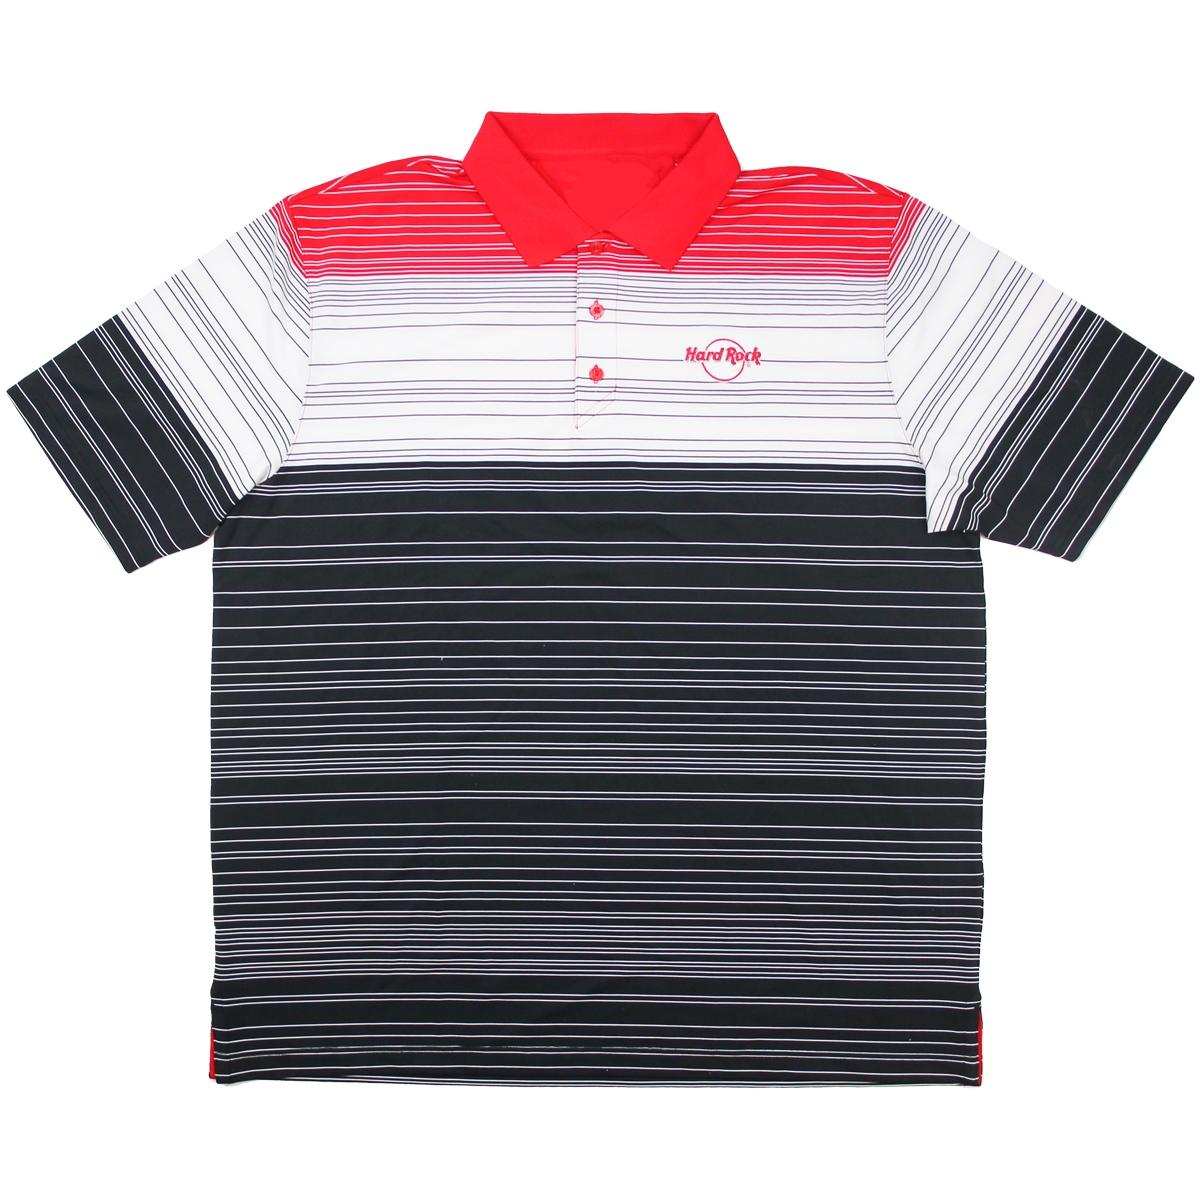 Mens Stripe Performance Polo Red Black White, Orlando Hotel 0